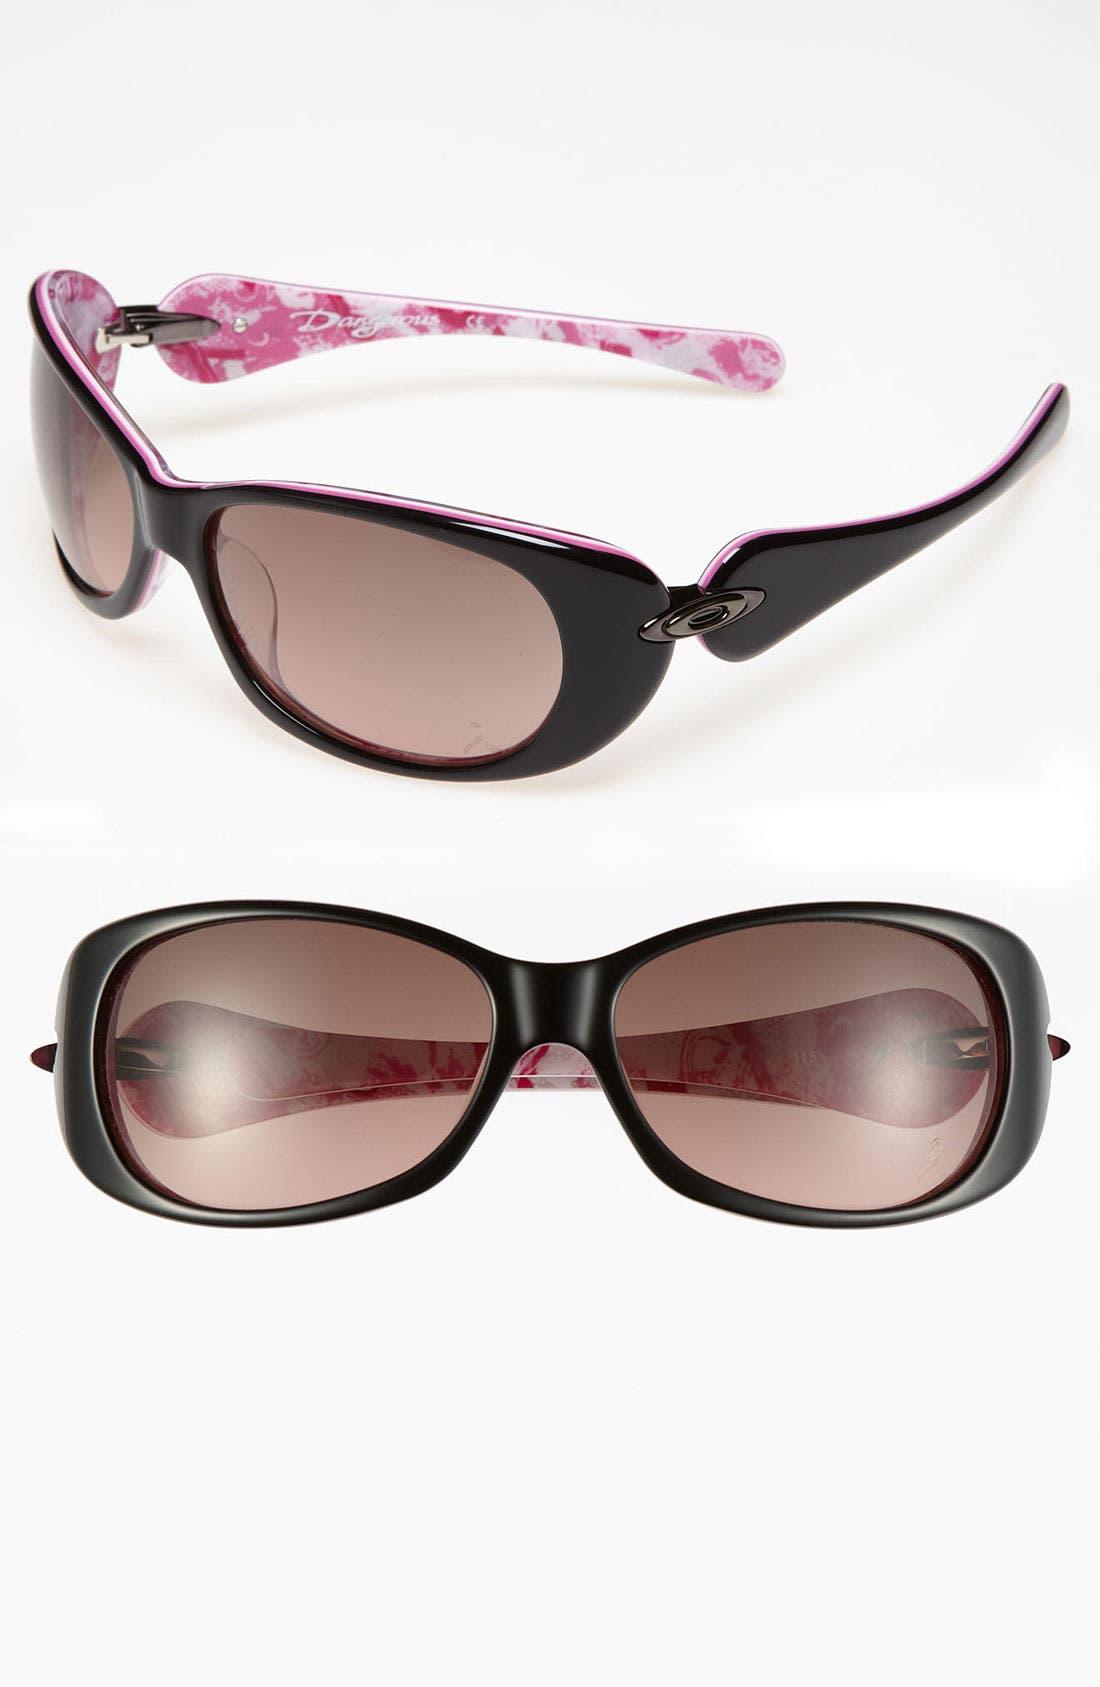 Main Image - Oakley 'Dangerous™' - Breast Cancer Awareness Edition' 61mm Sunglasses